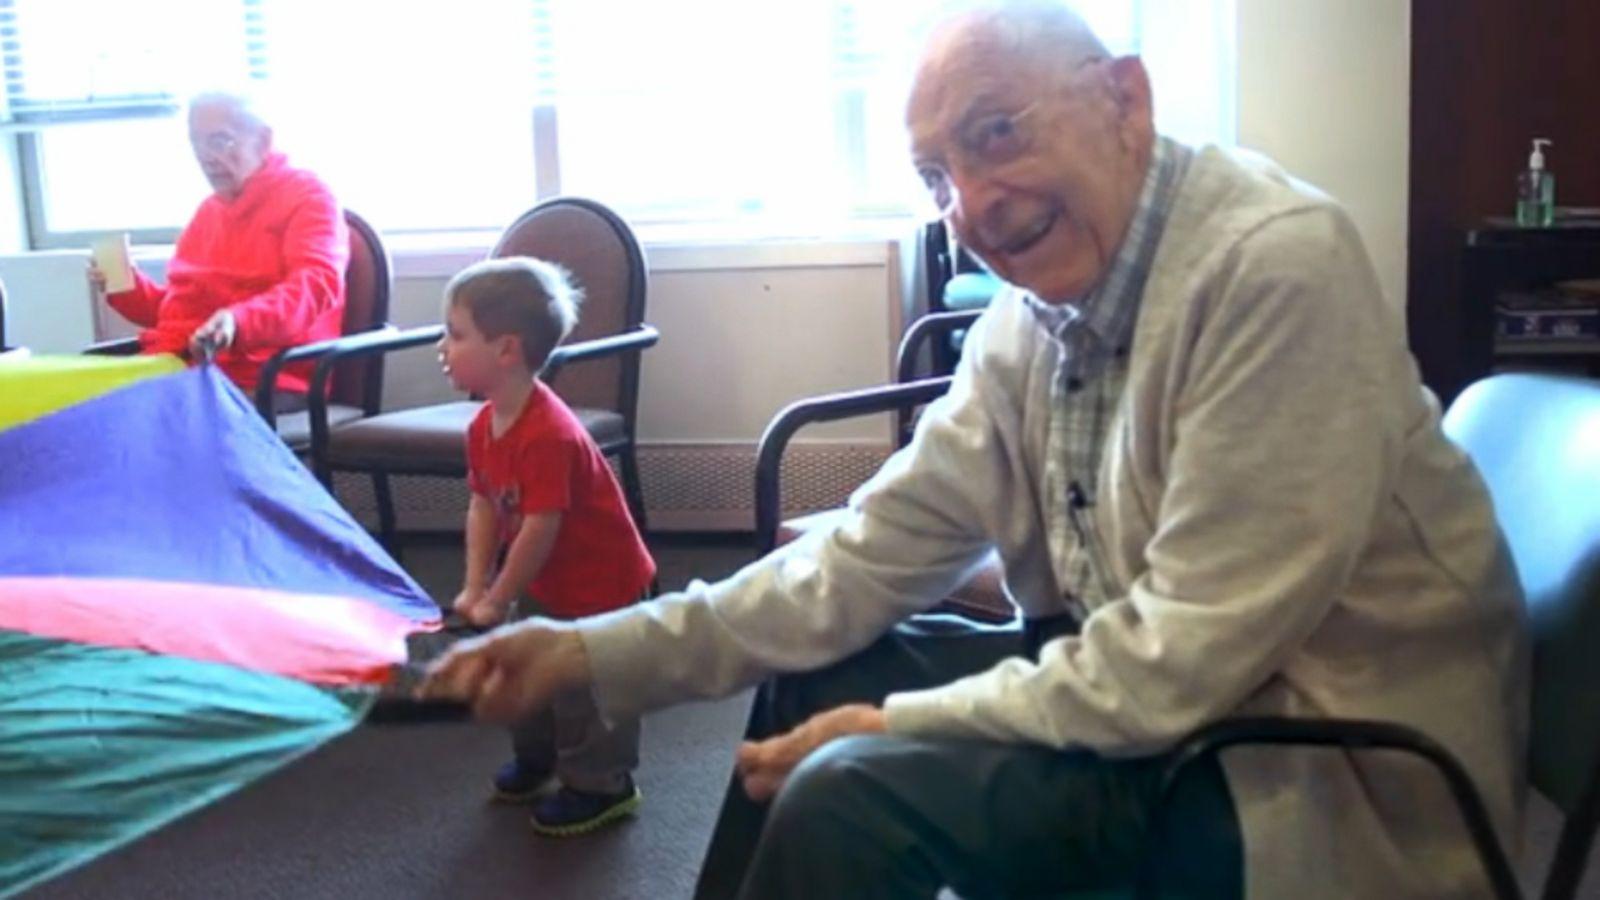 seattle preschool in a nursing home transforms elderly residents abc news